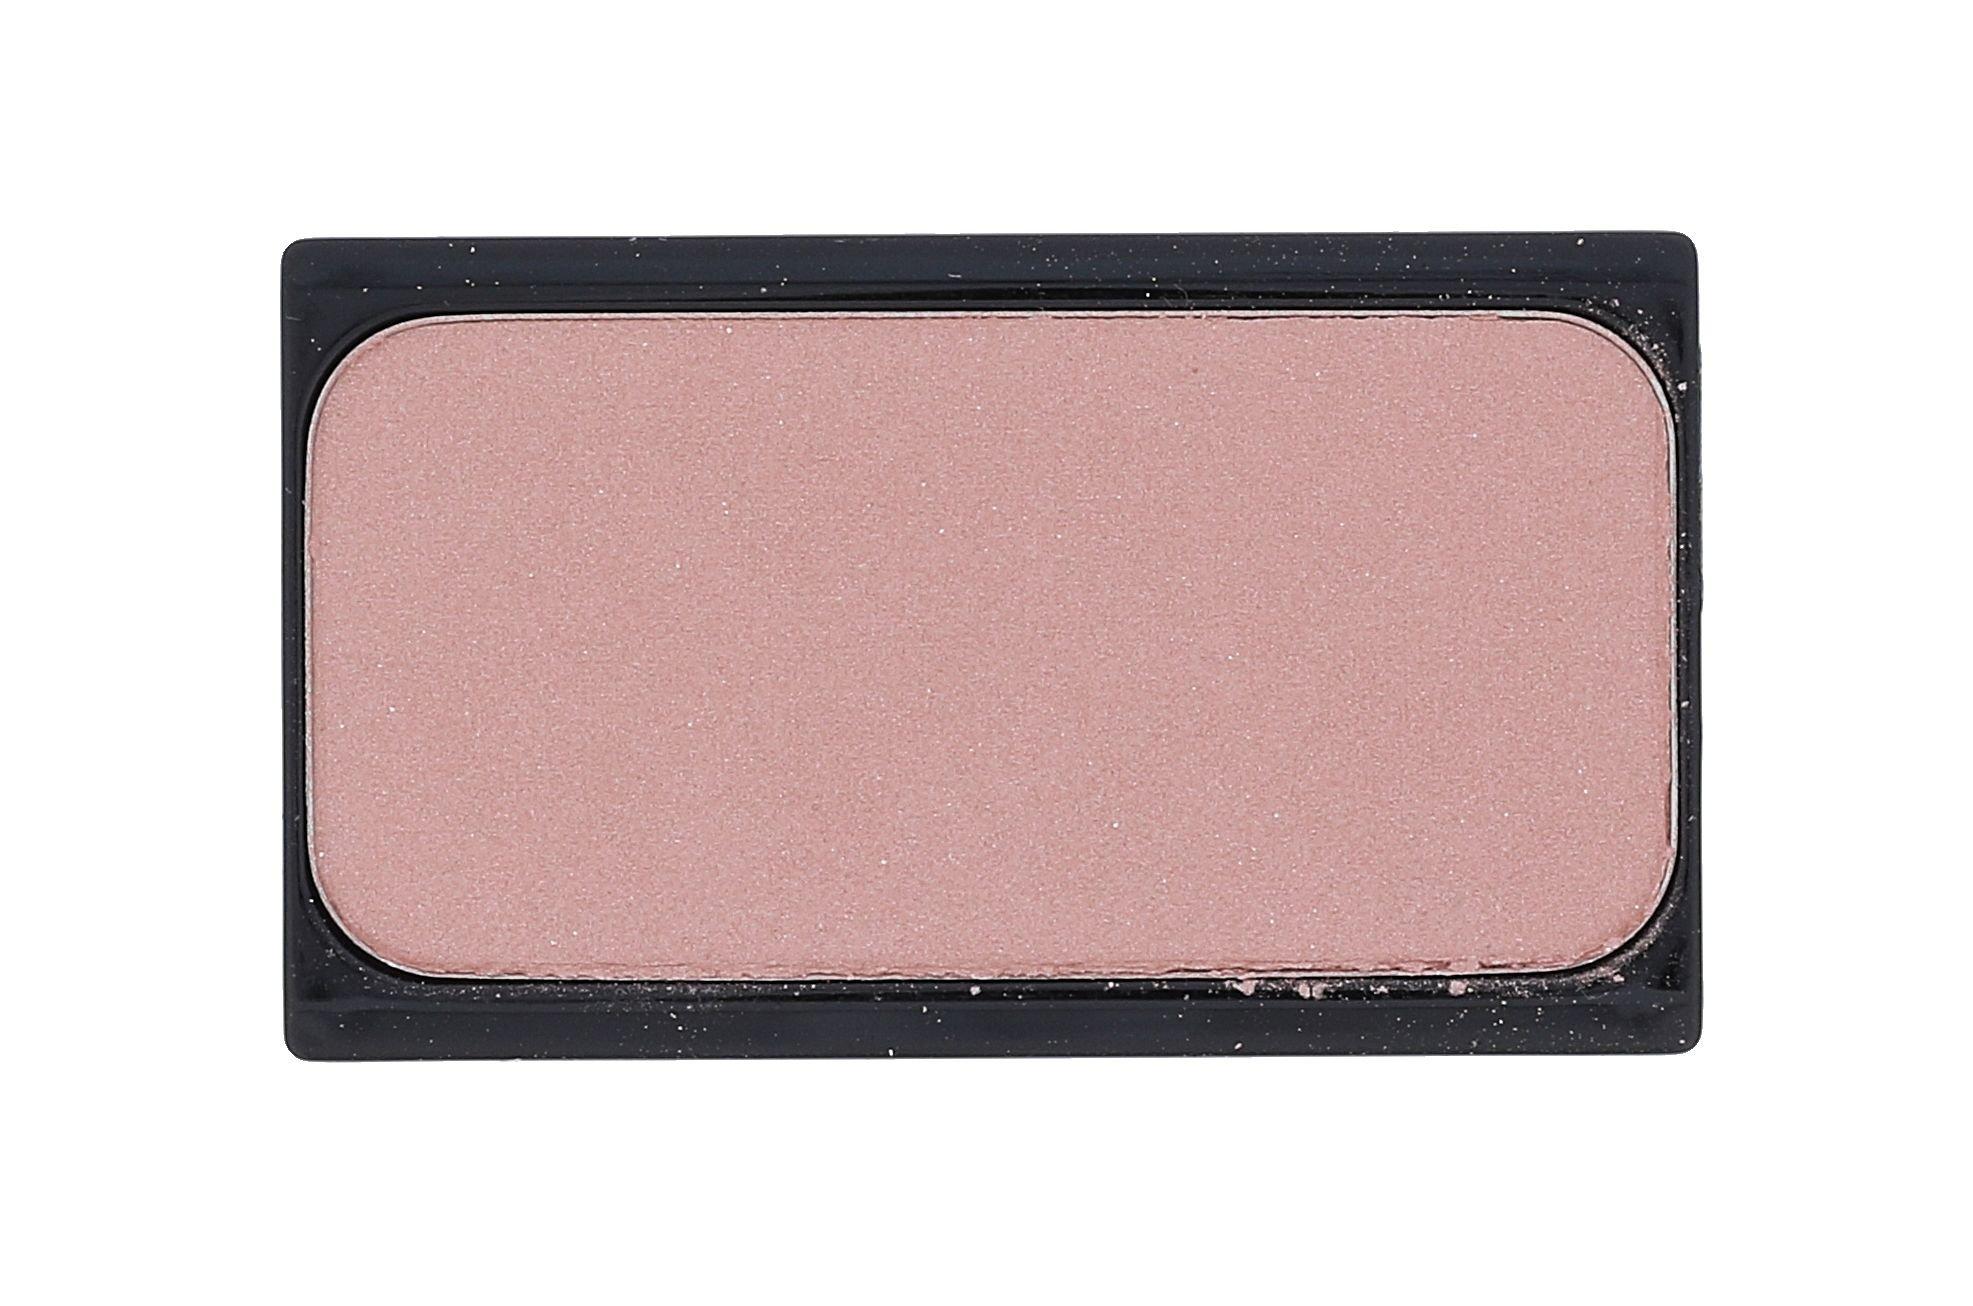 Artdeco Blusher Cosmetic 5ml 49 Light Beige Rose Blush